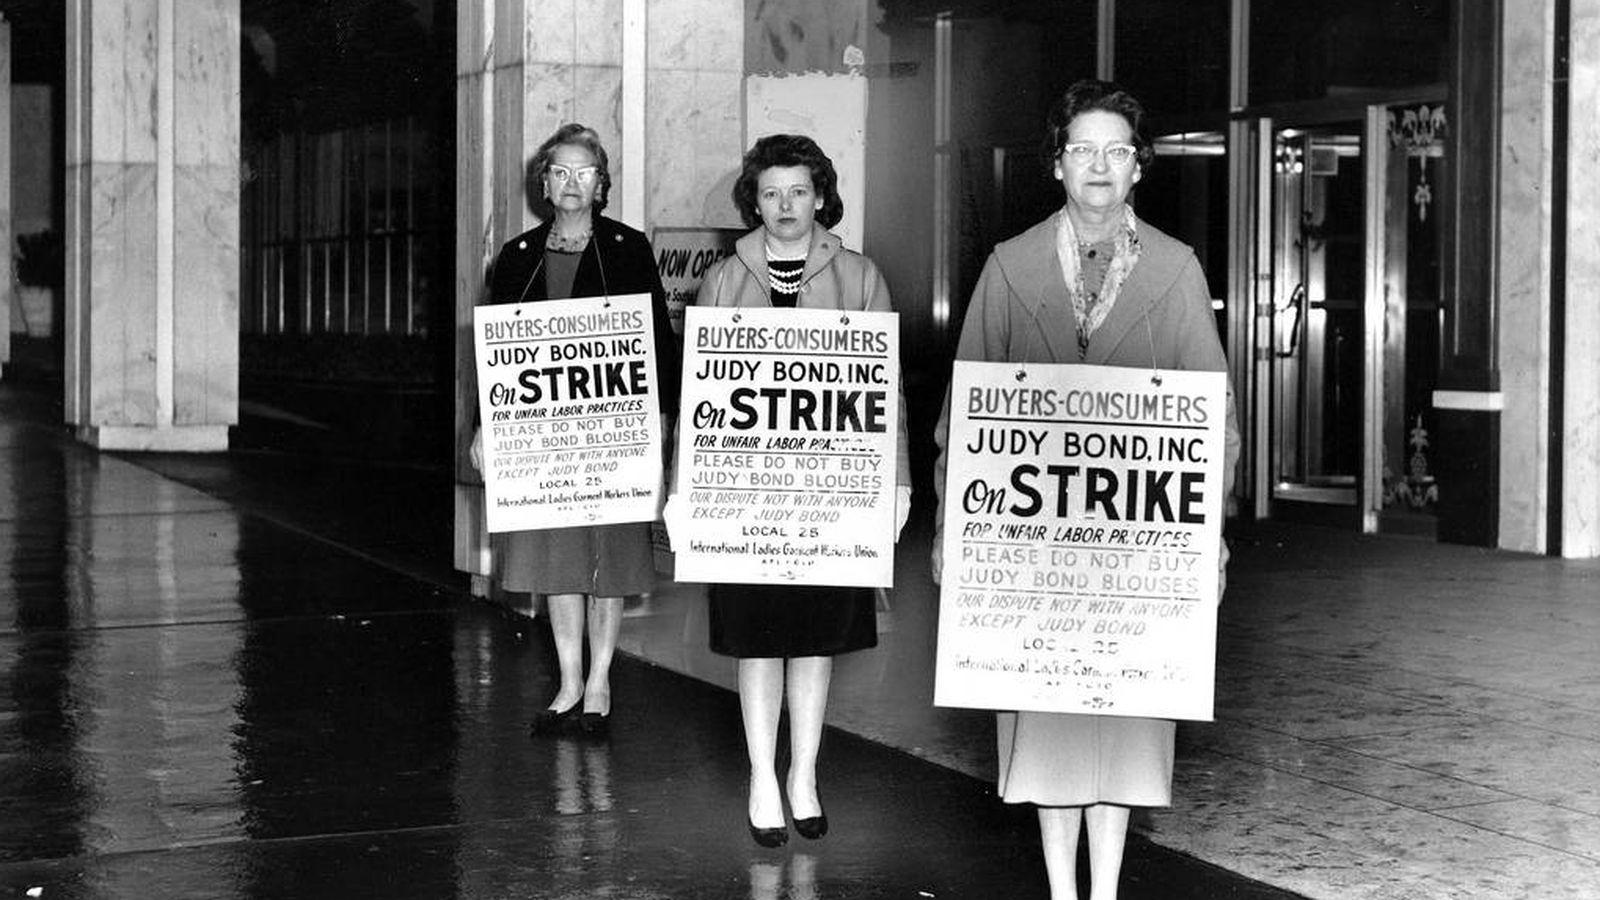 Foto: Huelga de consumo en Georgia (Estados Unidos) en 1962   Centro Kheel